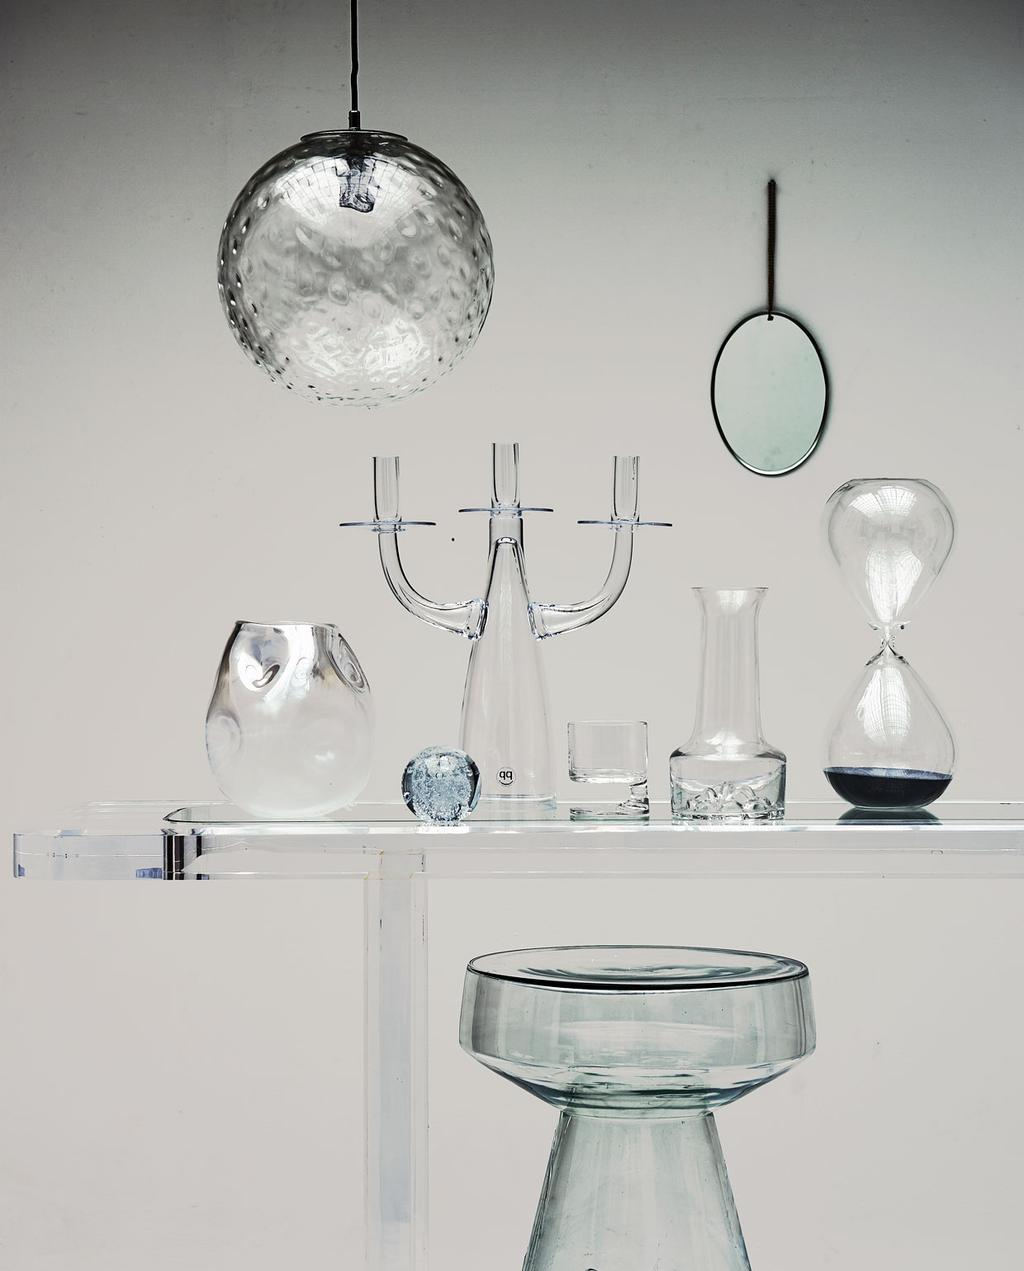 vtwonen | styling glas transparant